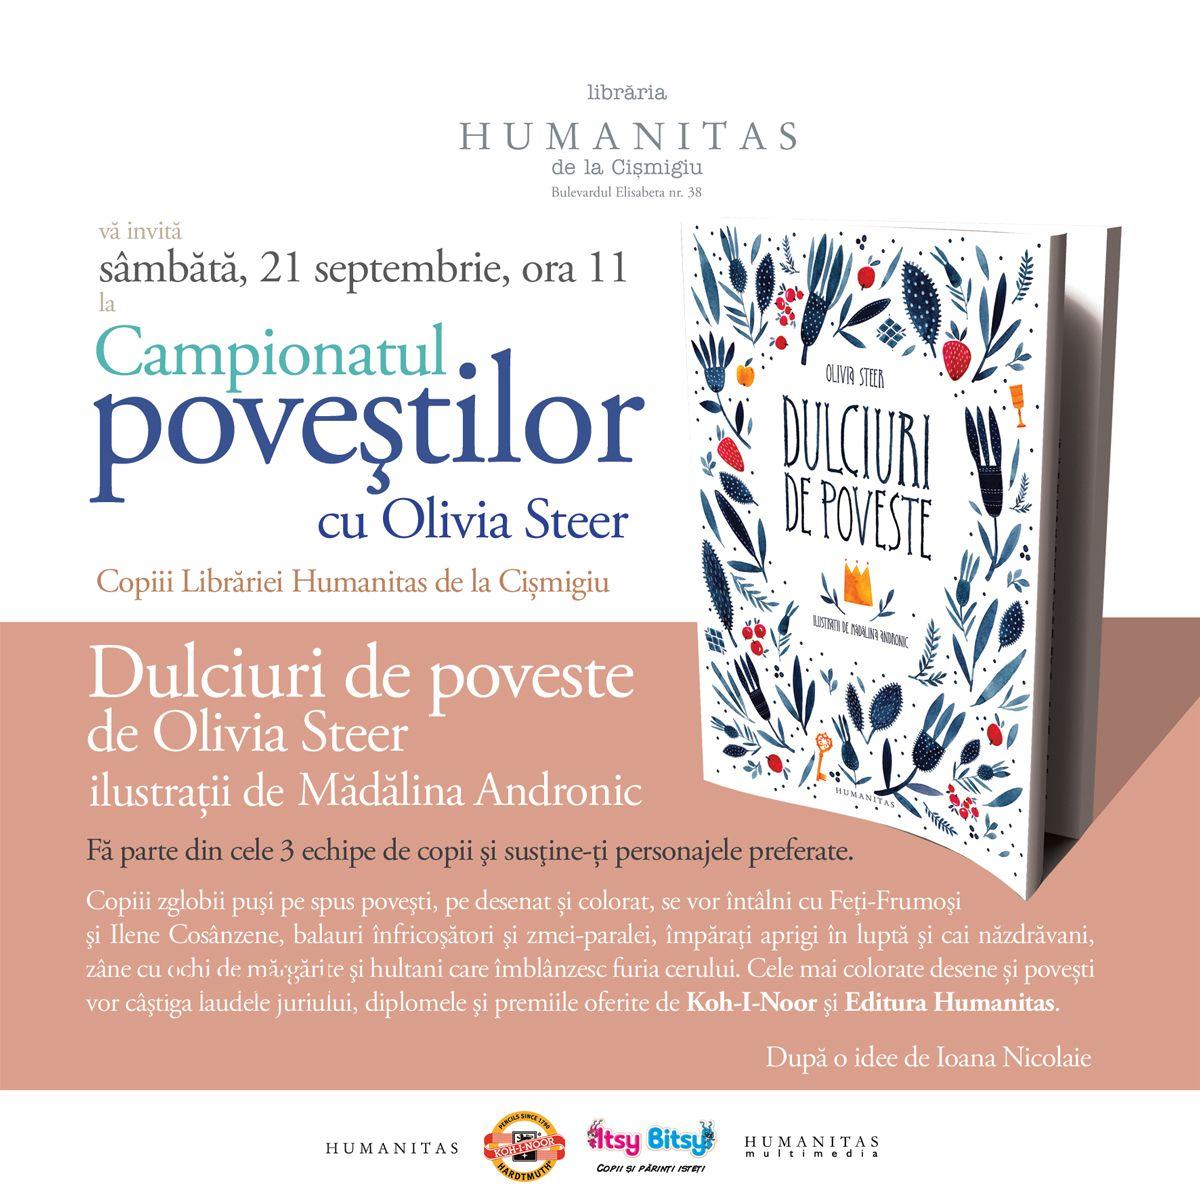 Libraria Humanitas de la Cismigiu va invita sambata, 21 septembrie, ora 11:00, la o noua editie a Campionatului Povestilor cu Olivia Steer.